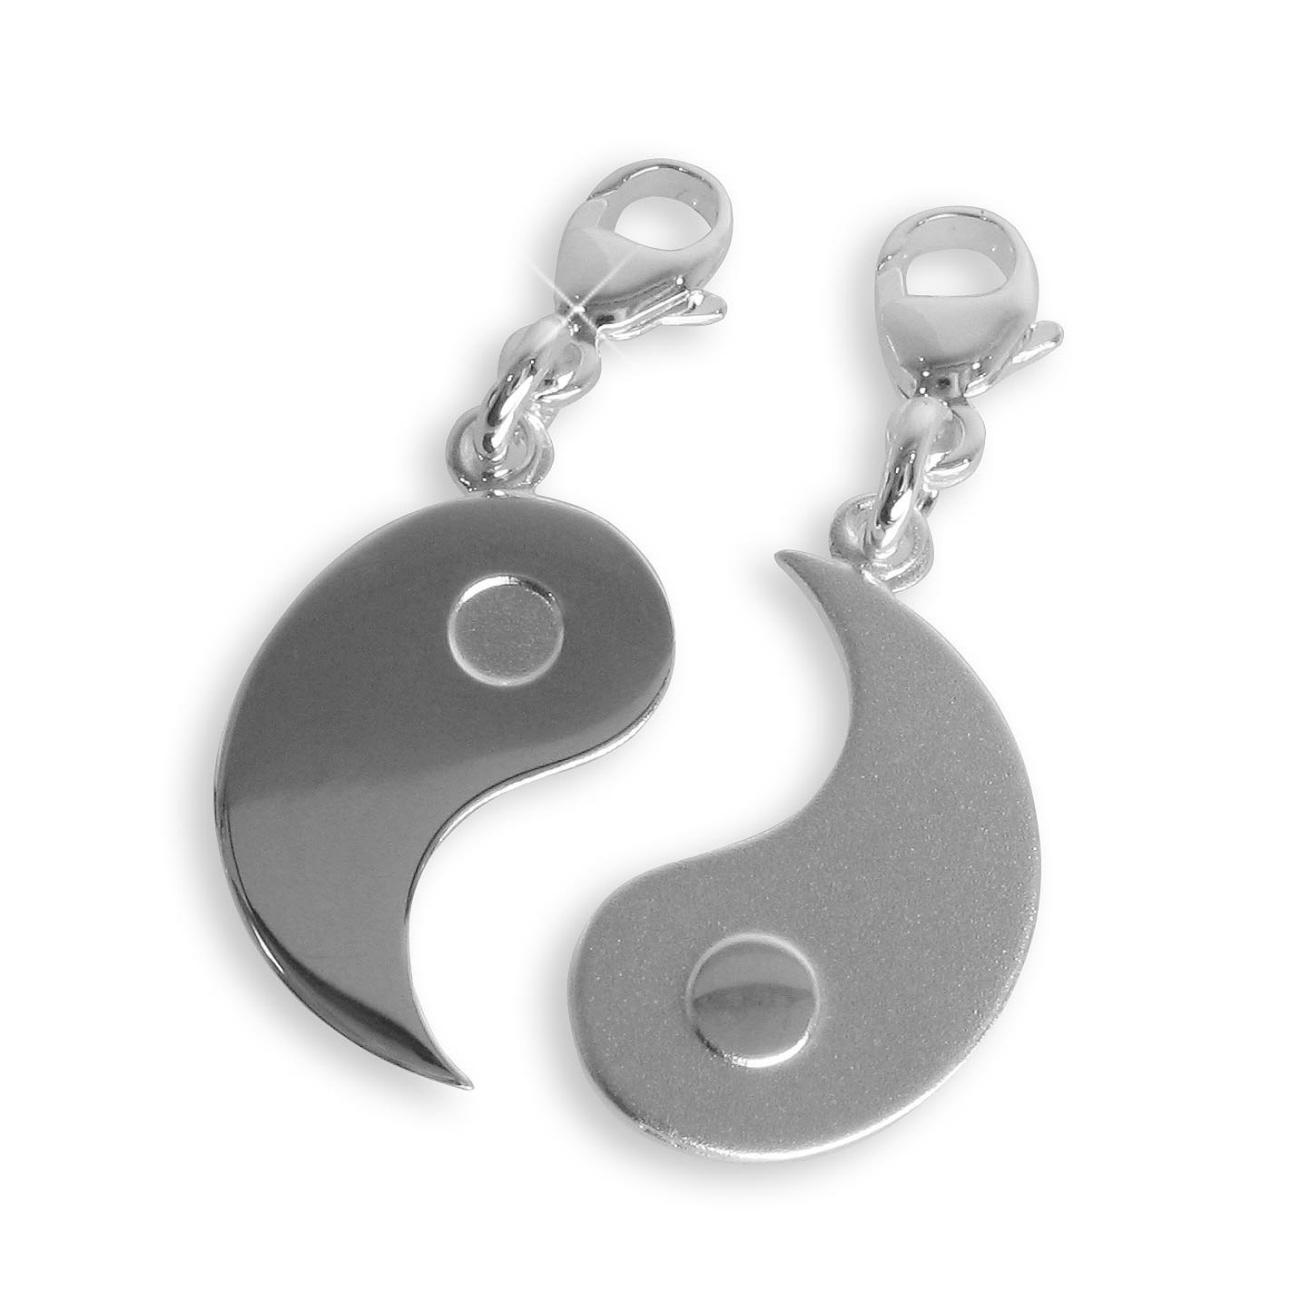 bilder yin und yang